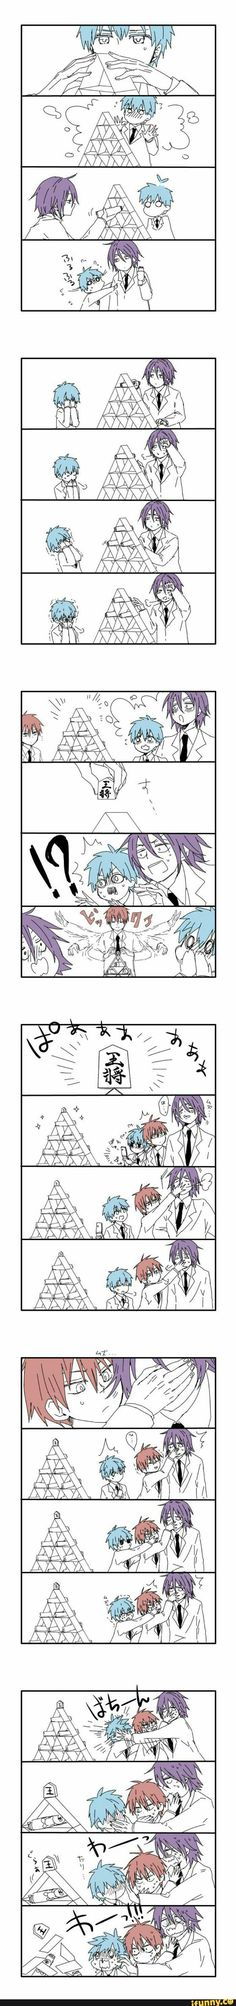 Kuroko, Murasakibara & Akashi | KnB